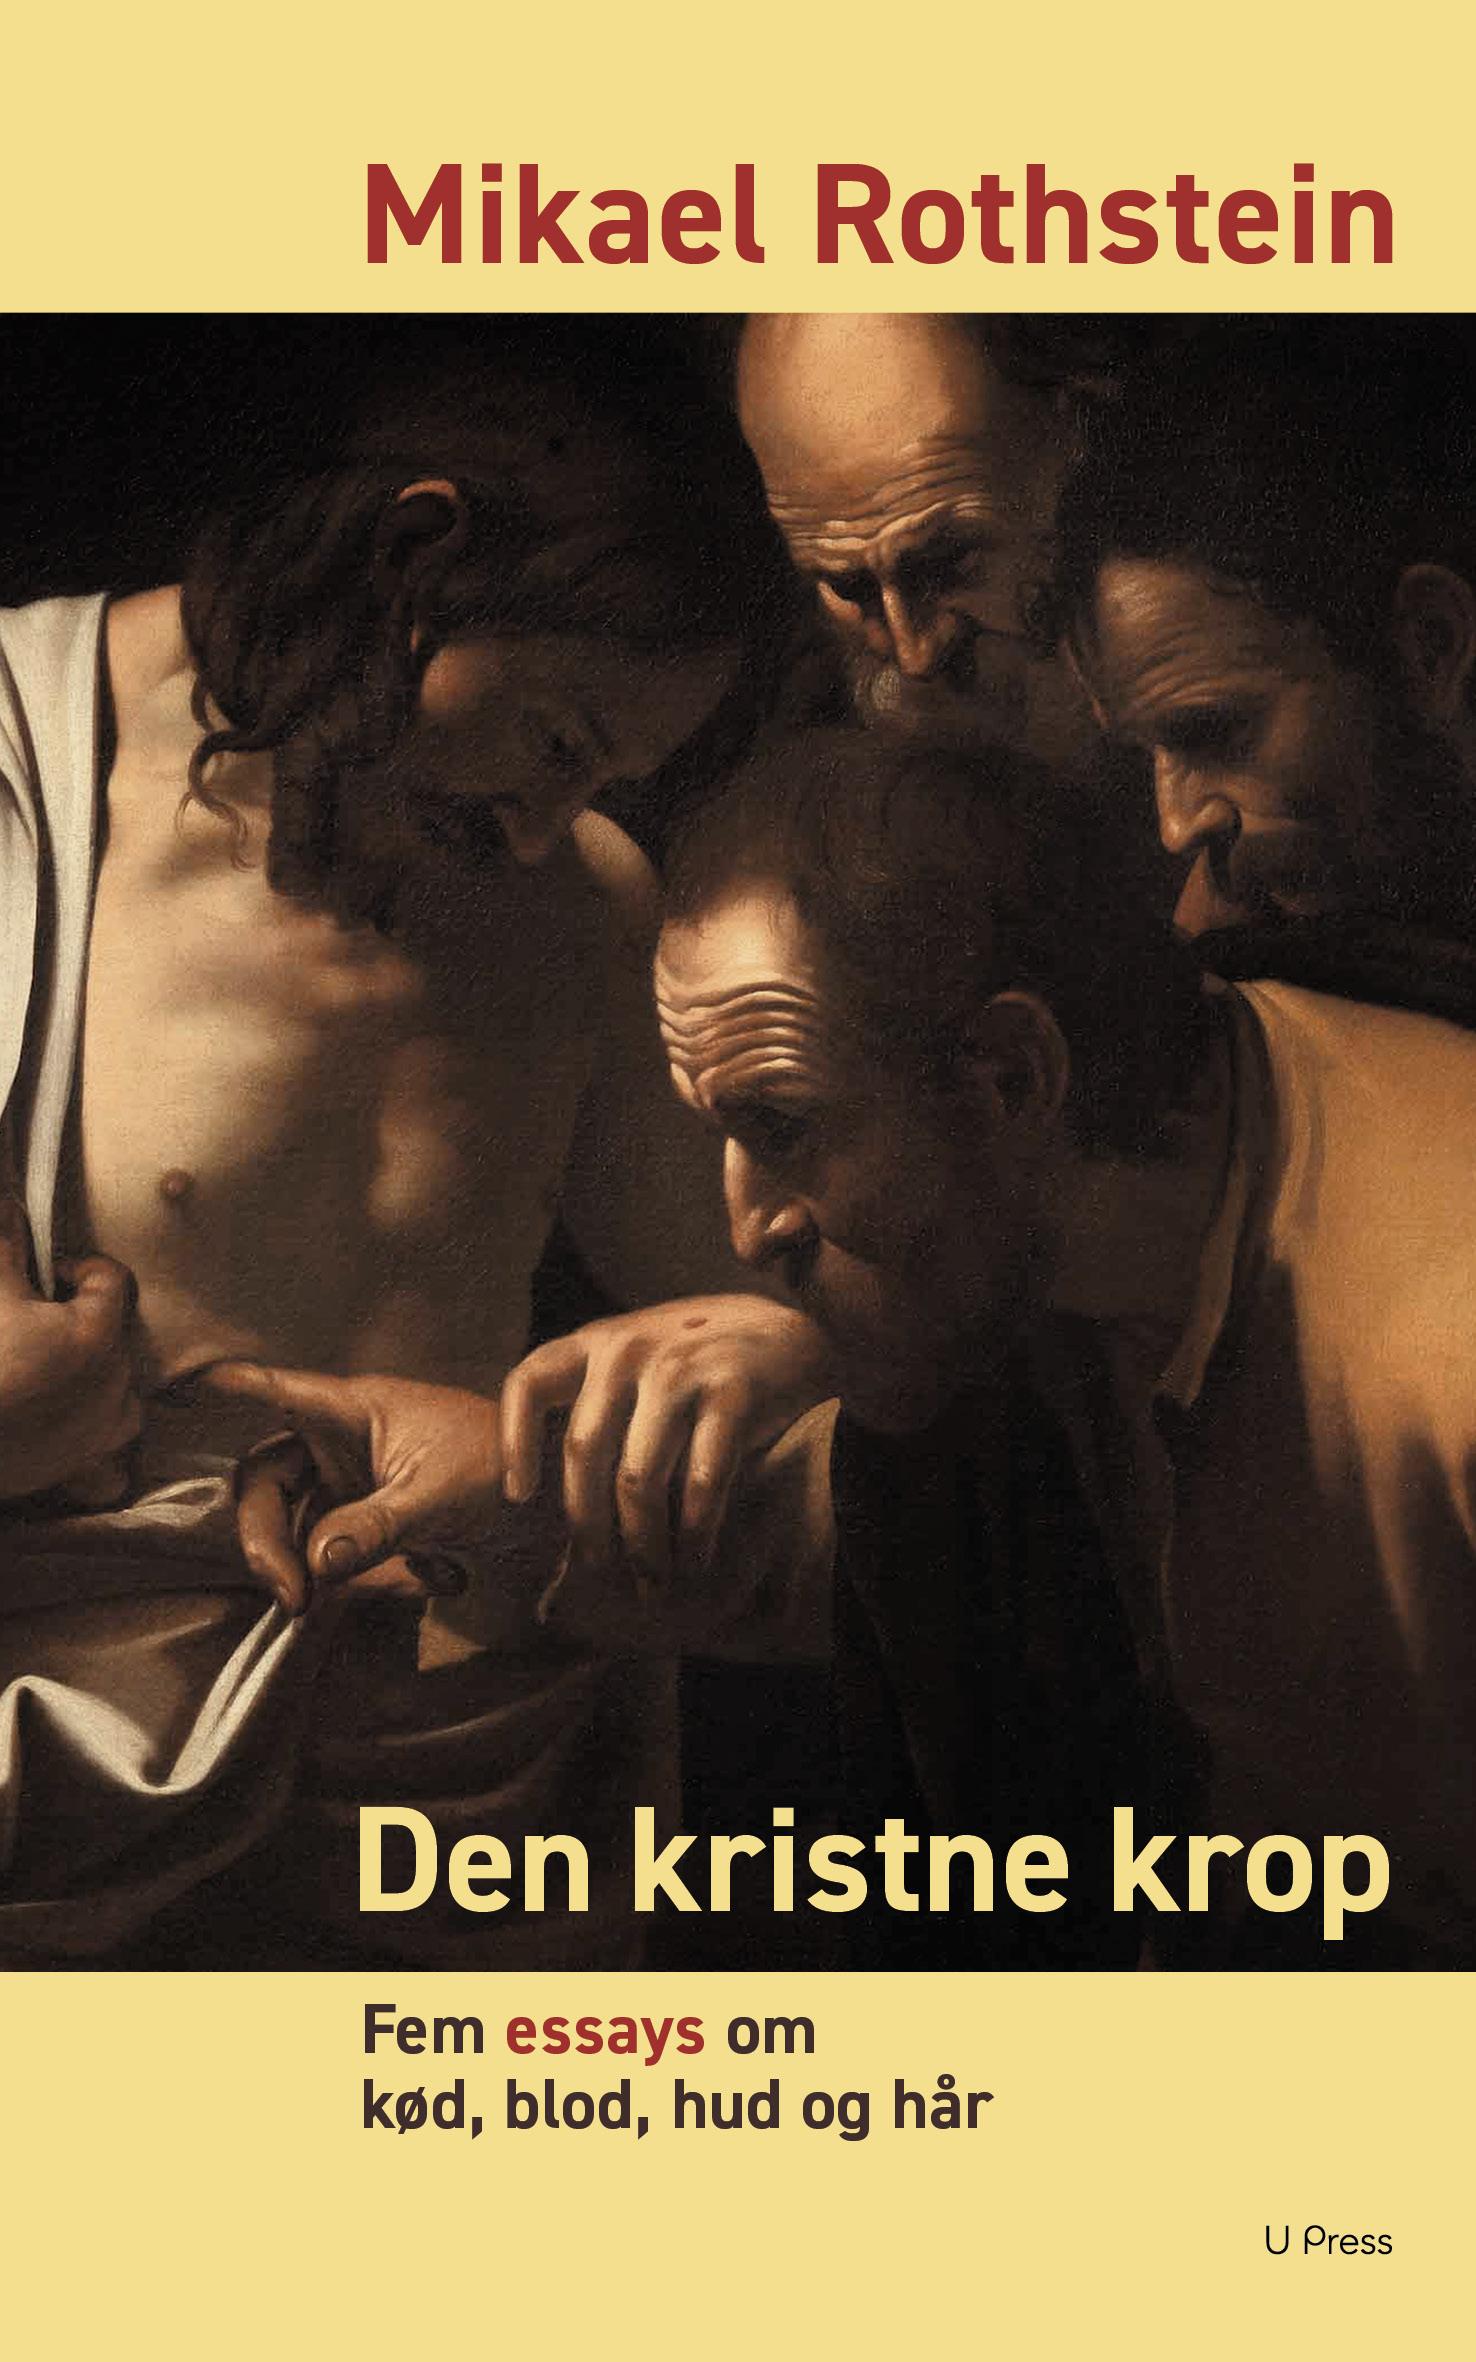 denkristnekrop_forside_web